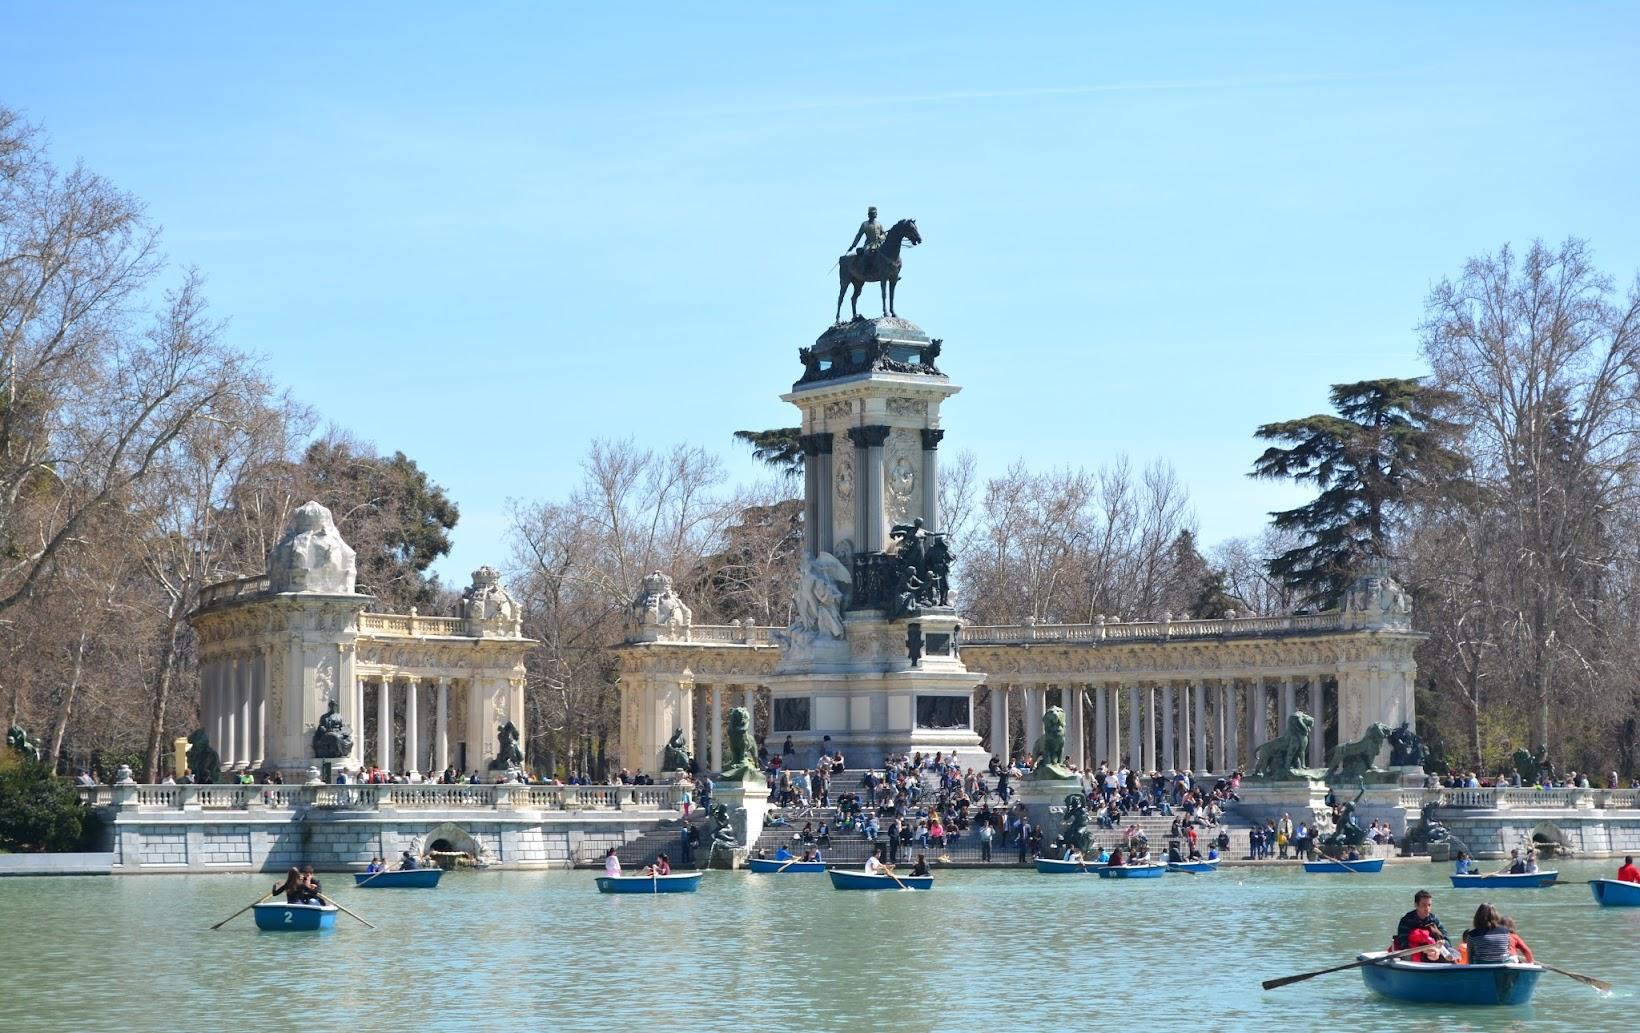 Retiro Park, Parque del Retiro, estanque del Retiro, row boats in Retiro